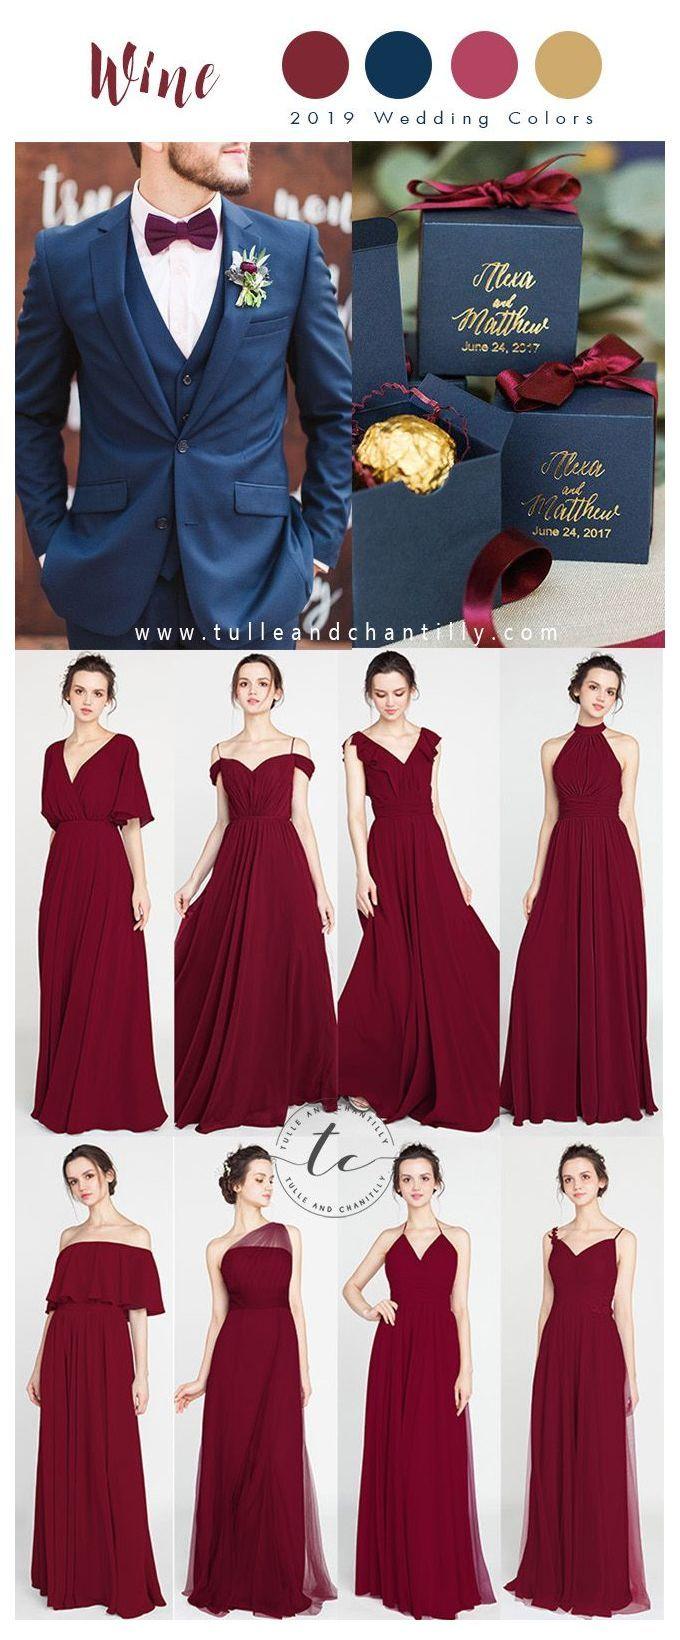 Wine Color Dress For Wedding Long Short Bridesmaid Dresses 80 149 Si Wine Bridesmaid Dresses Wine Color Bridesmaid Dress Christmas Bridesmaid Dresses